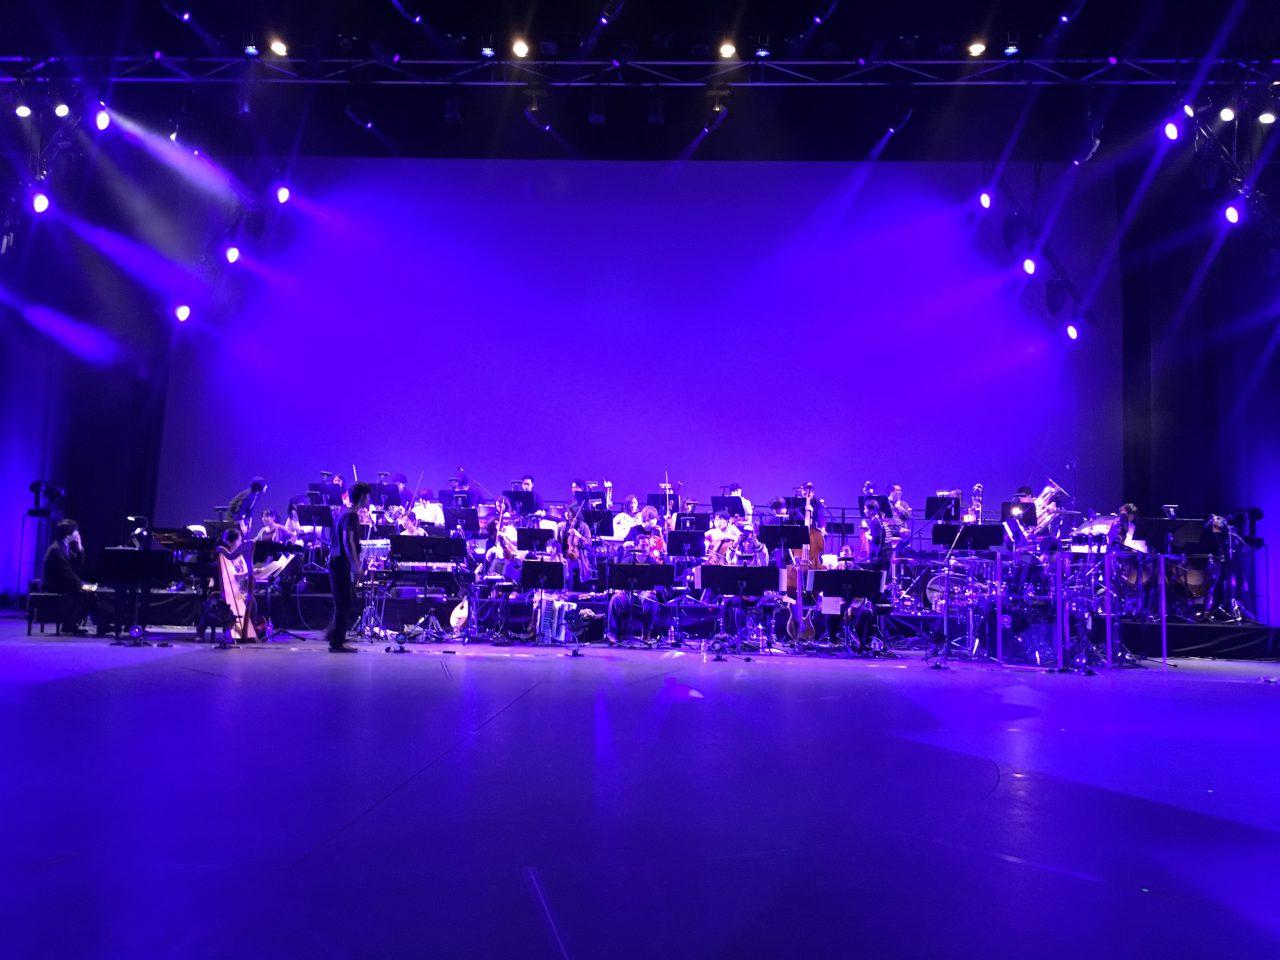 Xenogears 20th Anniversary Concert Reheasal 1日目